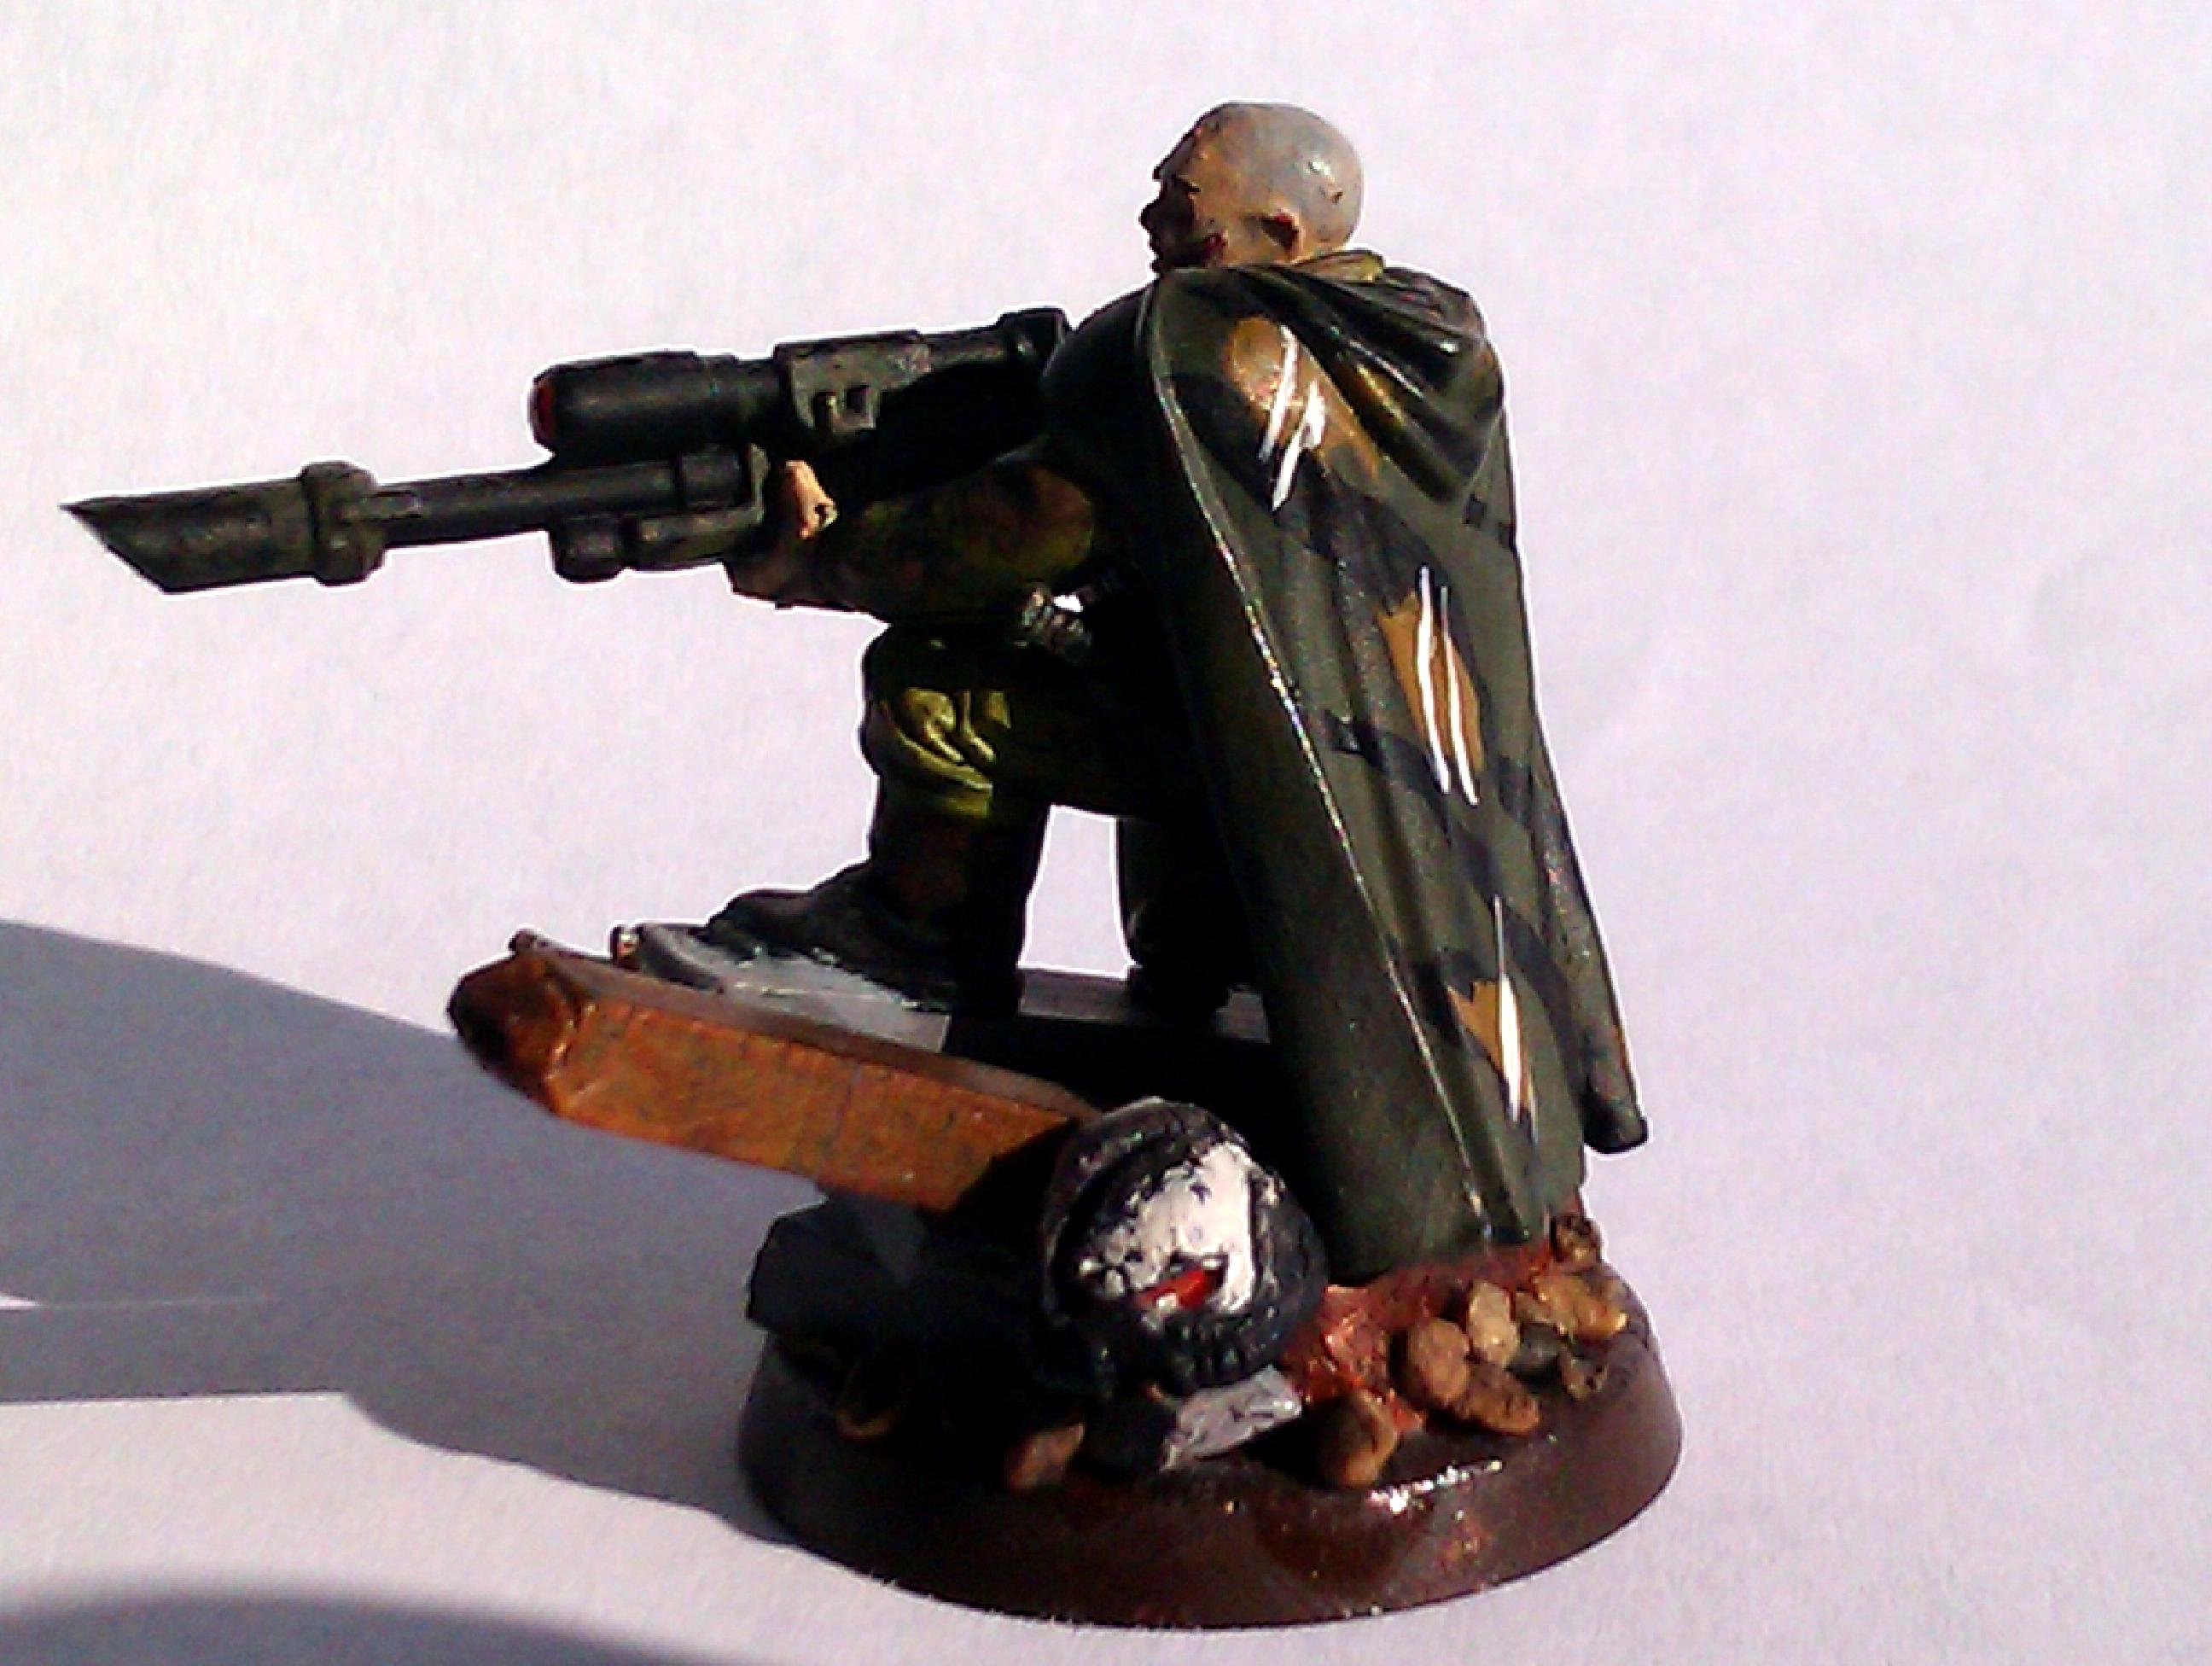 Assasin, Base, Cammo, Diktatorn, Imperial Guard, Snipers, Sweden